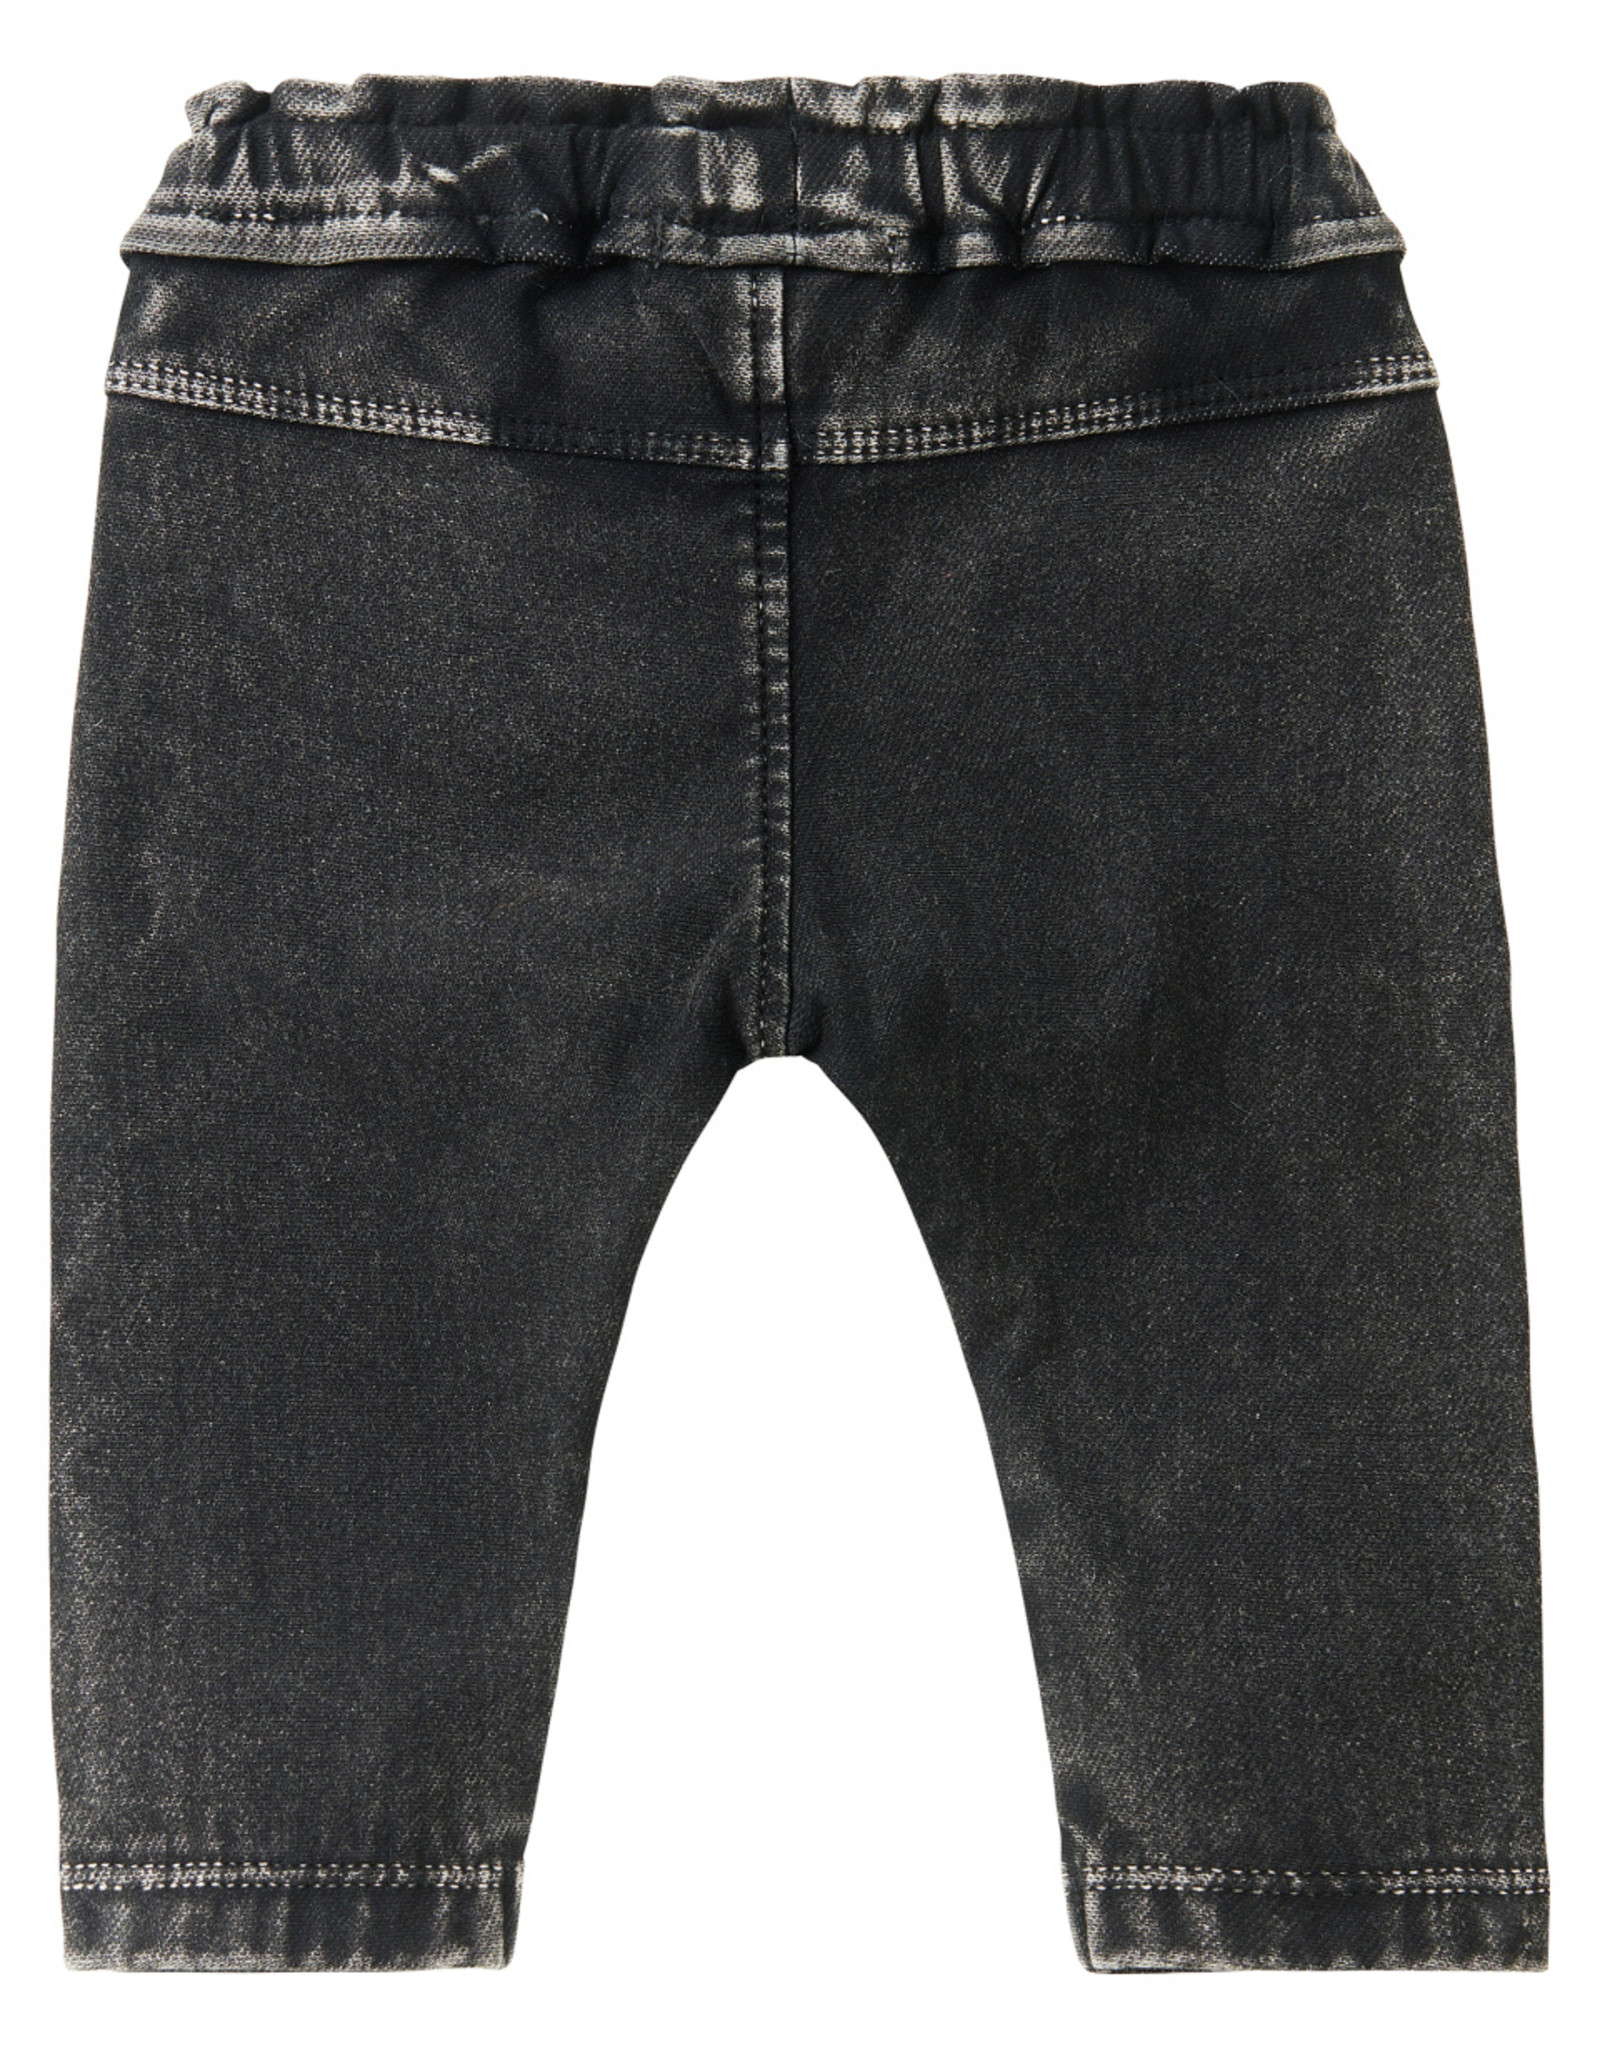 Noppies Noppies G Regular Fit Pants Sachse Dark Grey Wash